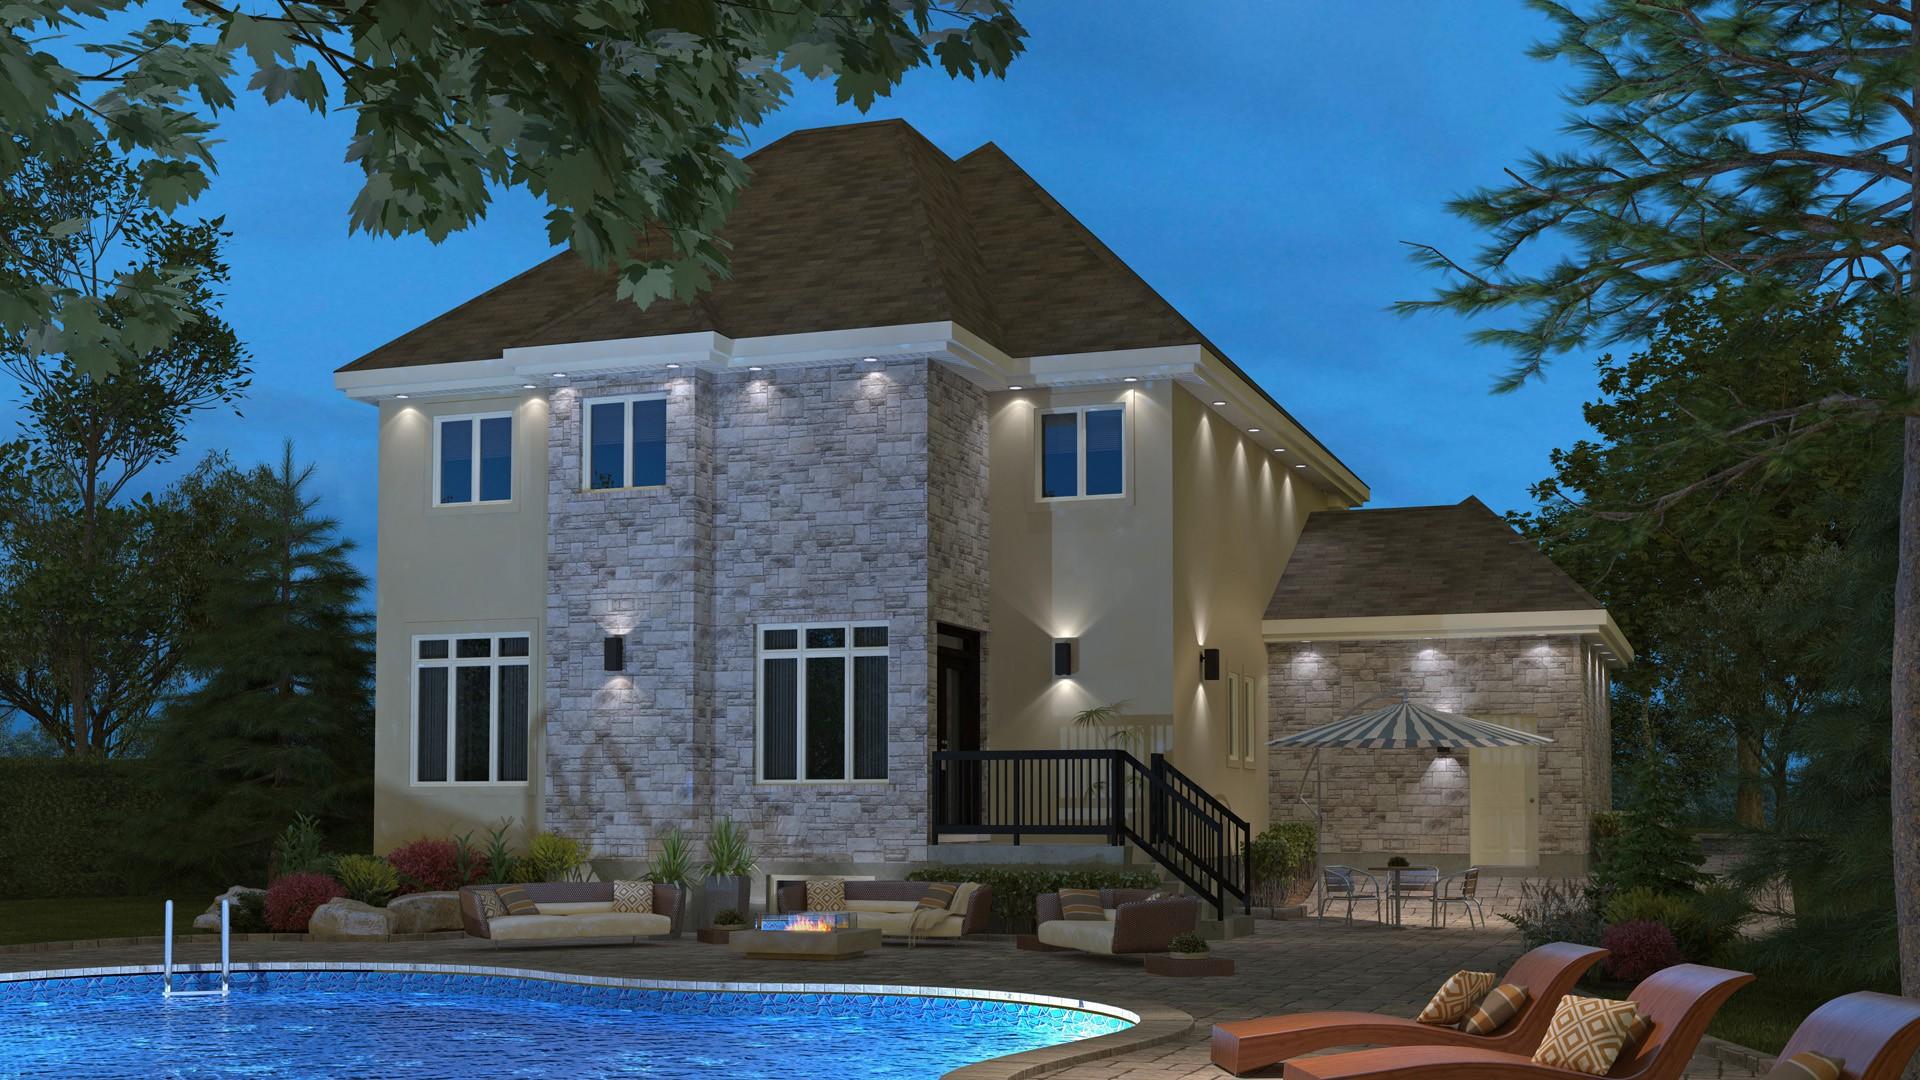 Contemporary Cottage_Sunbury_Luxury Home_Domicilde prestige_Domicil